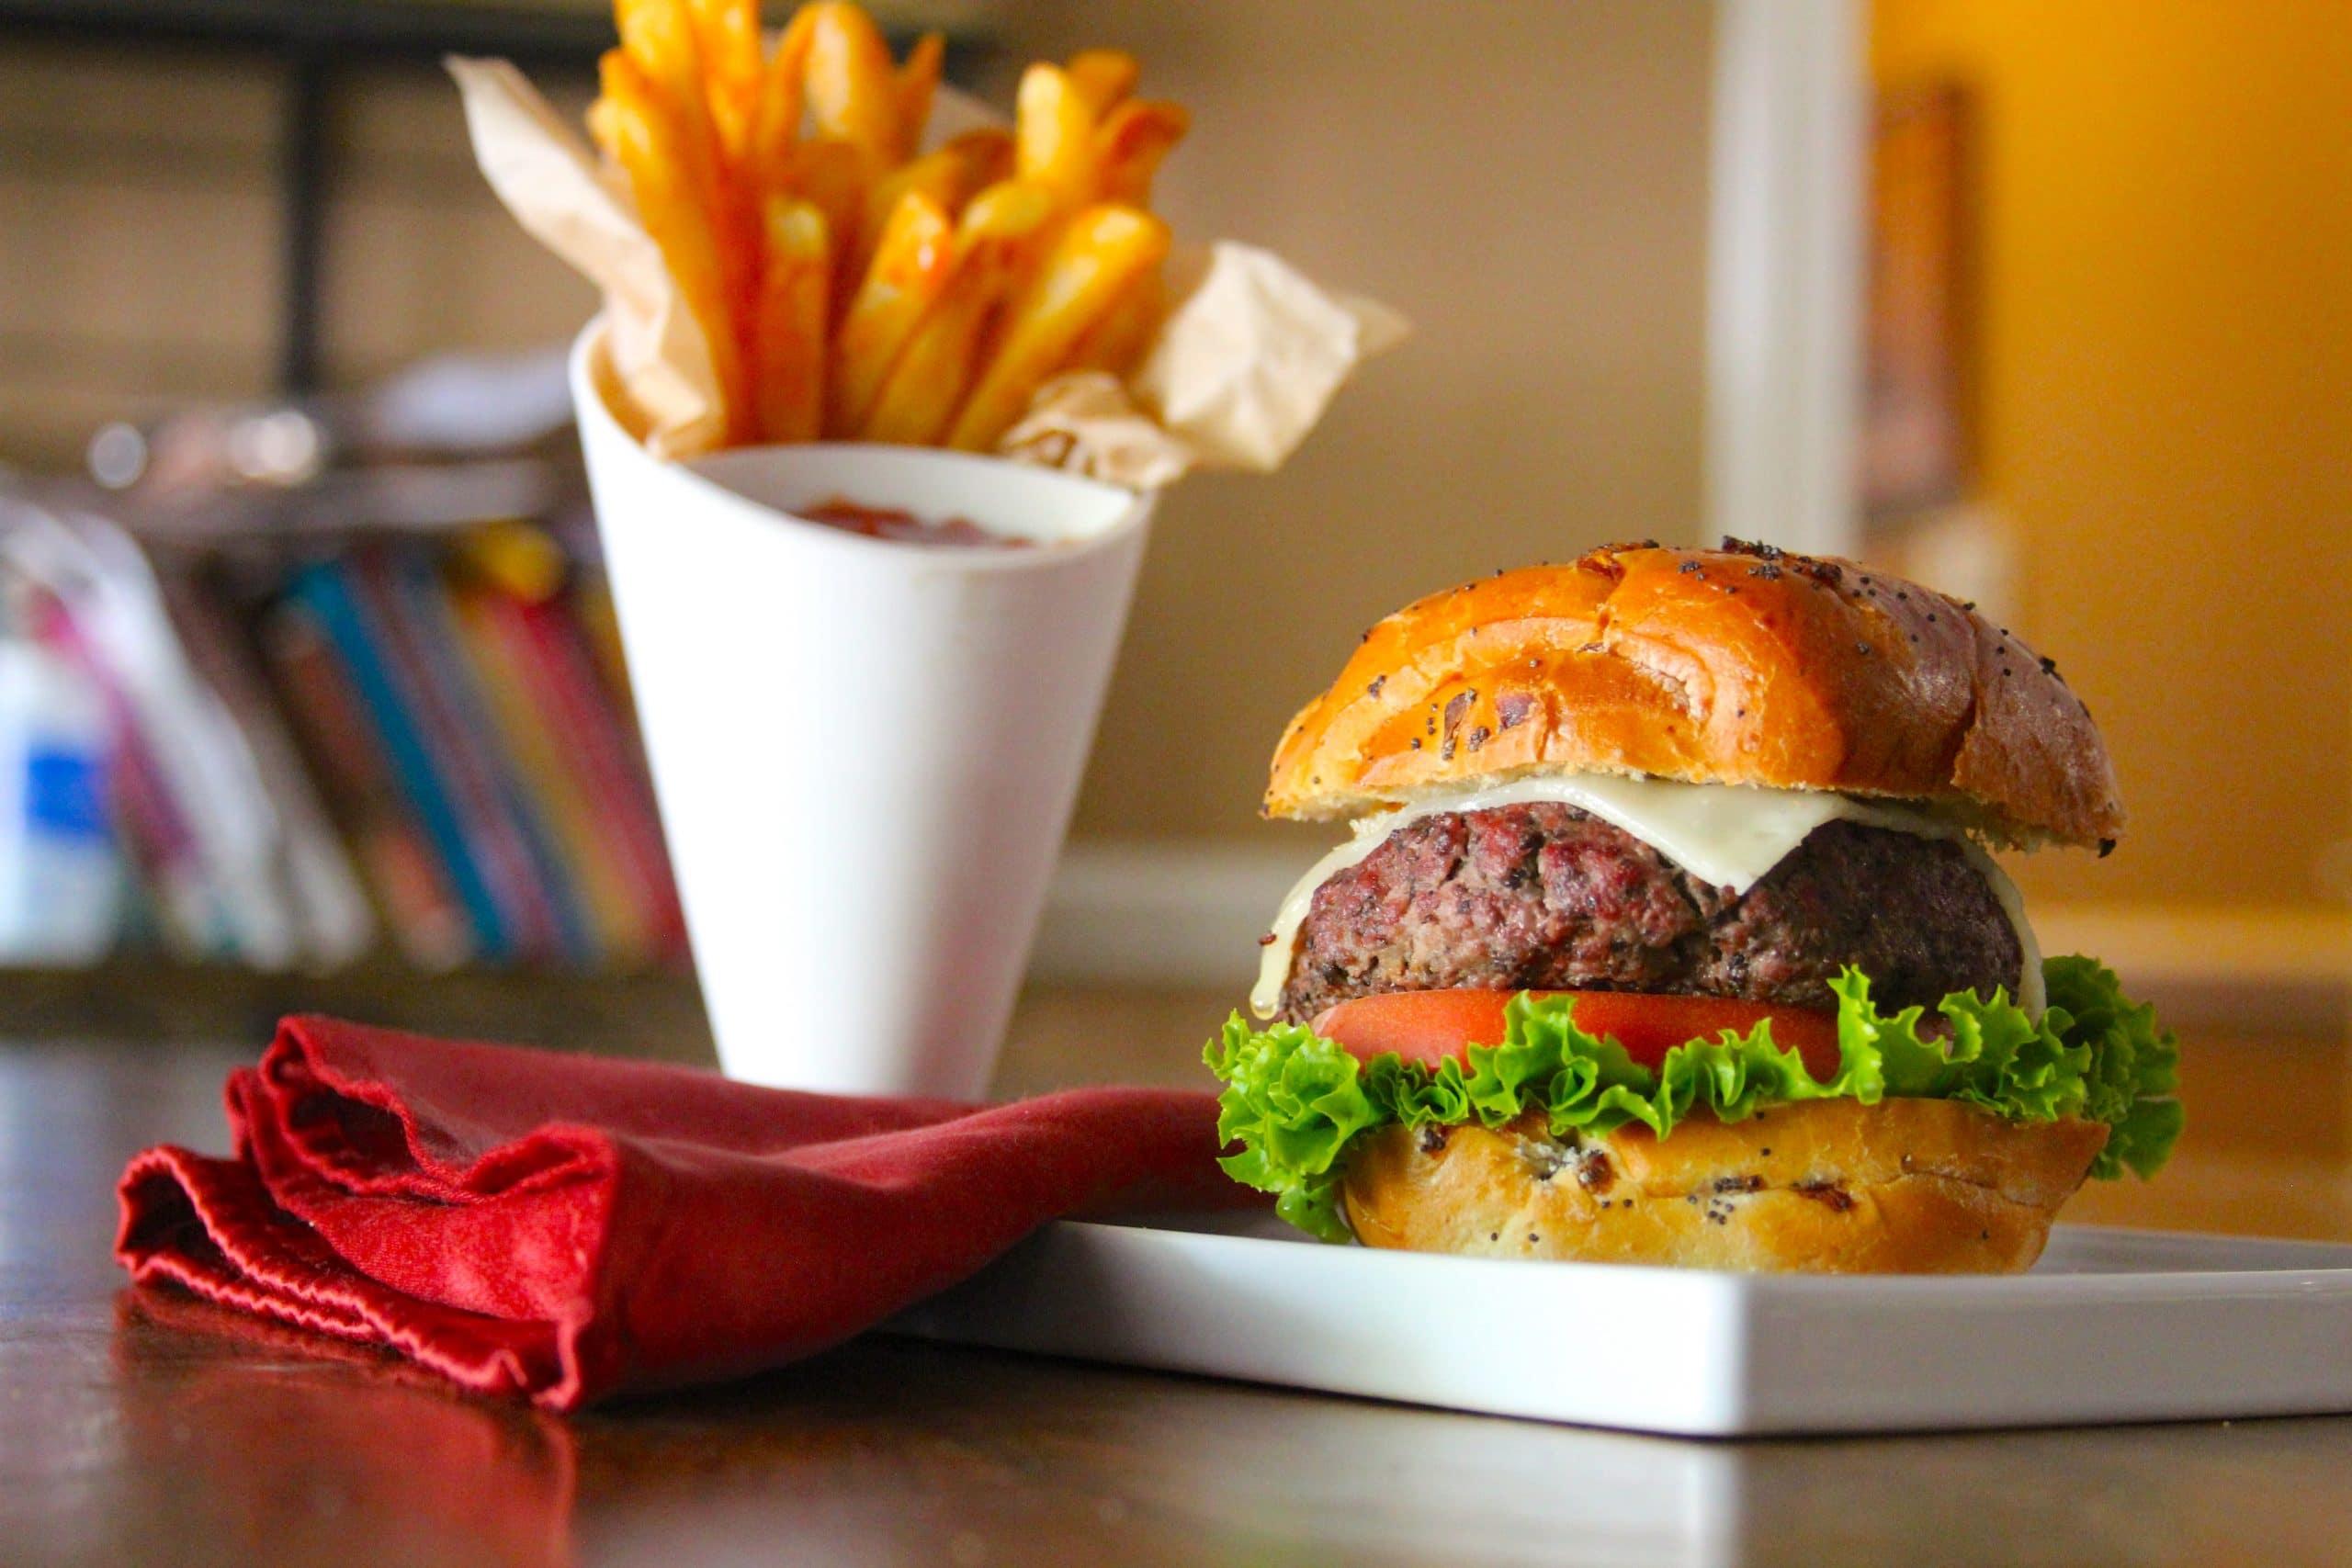 Mushroom and beef blended burger